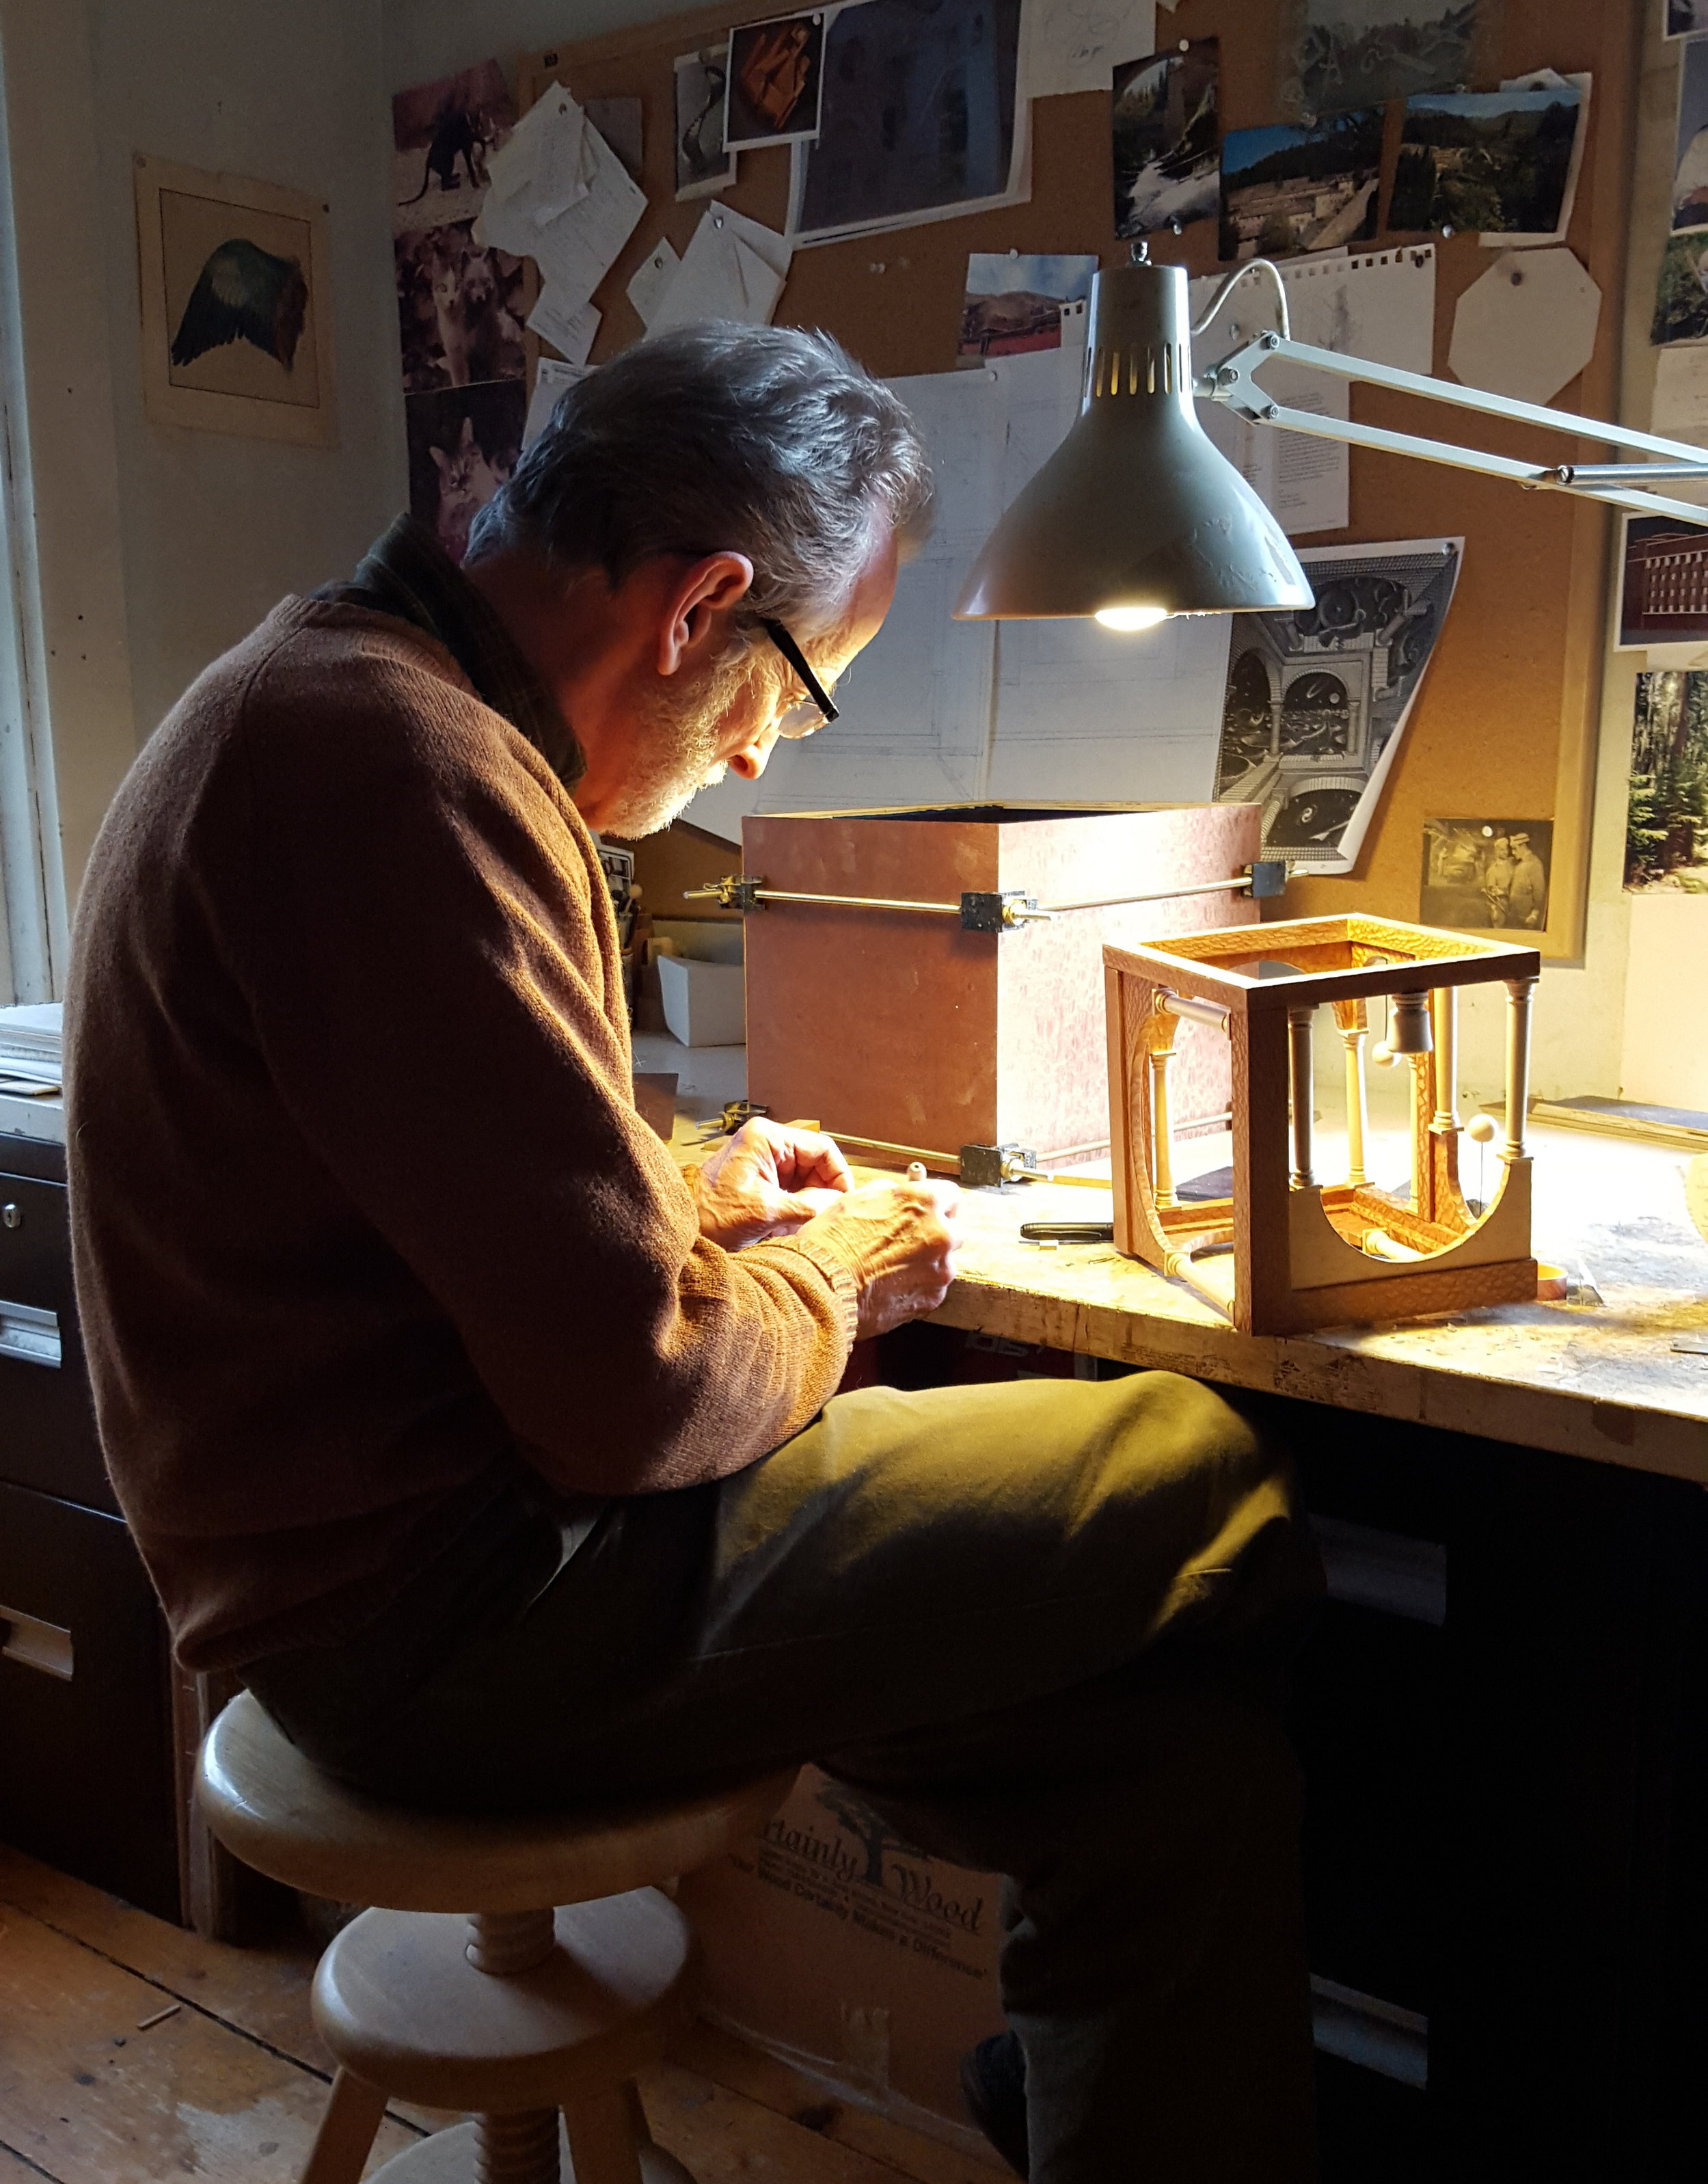 Jay+working.jpg